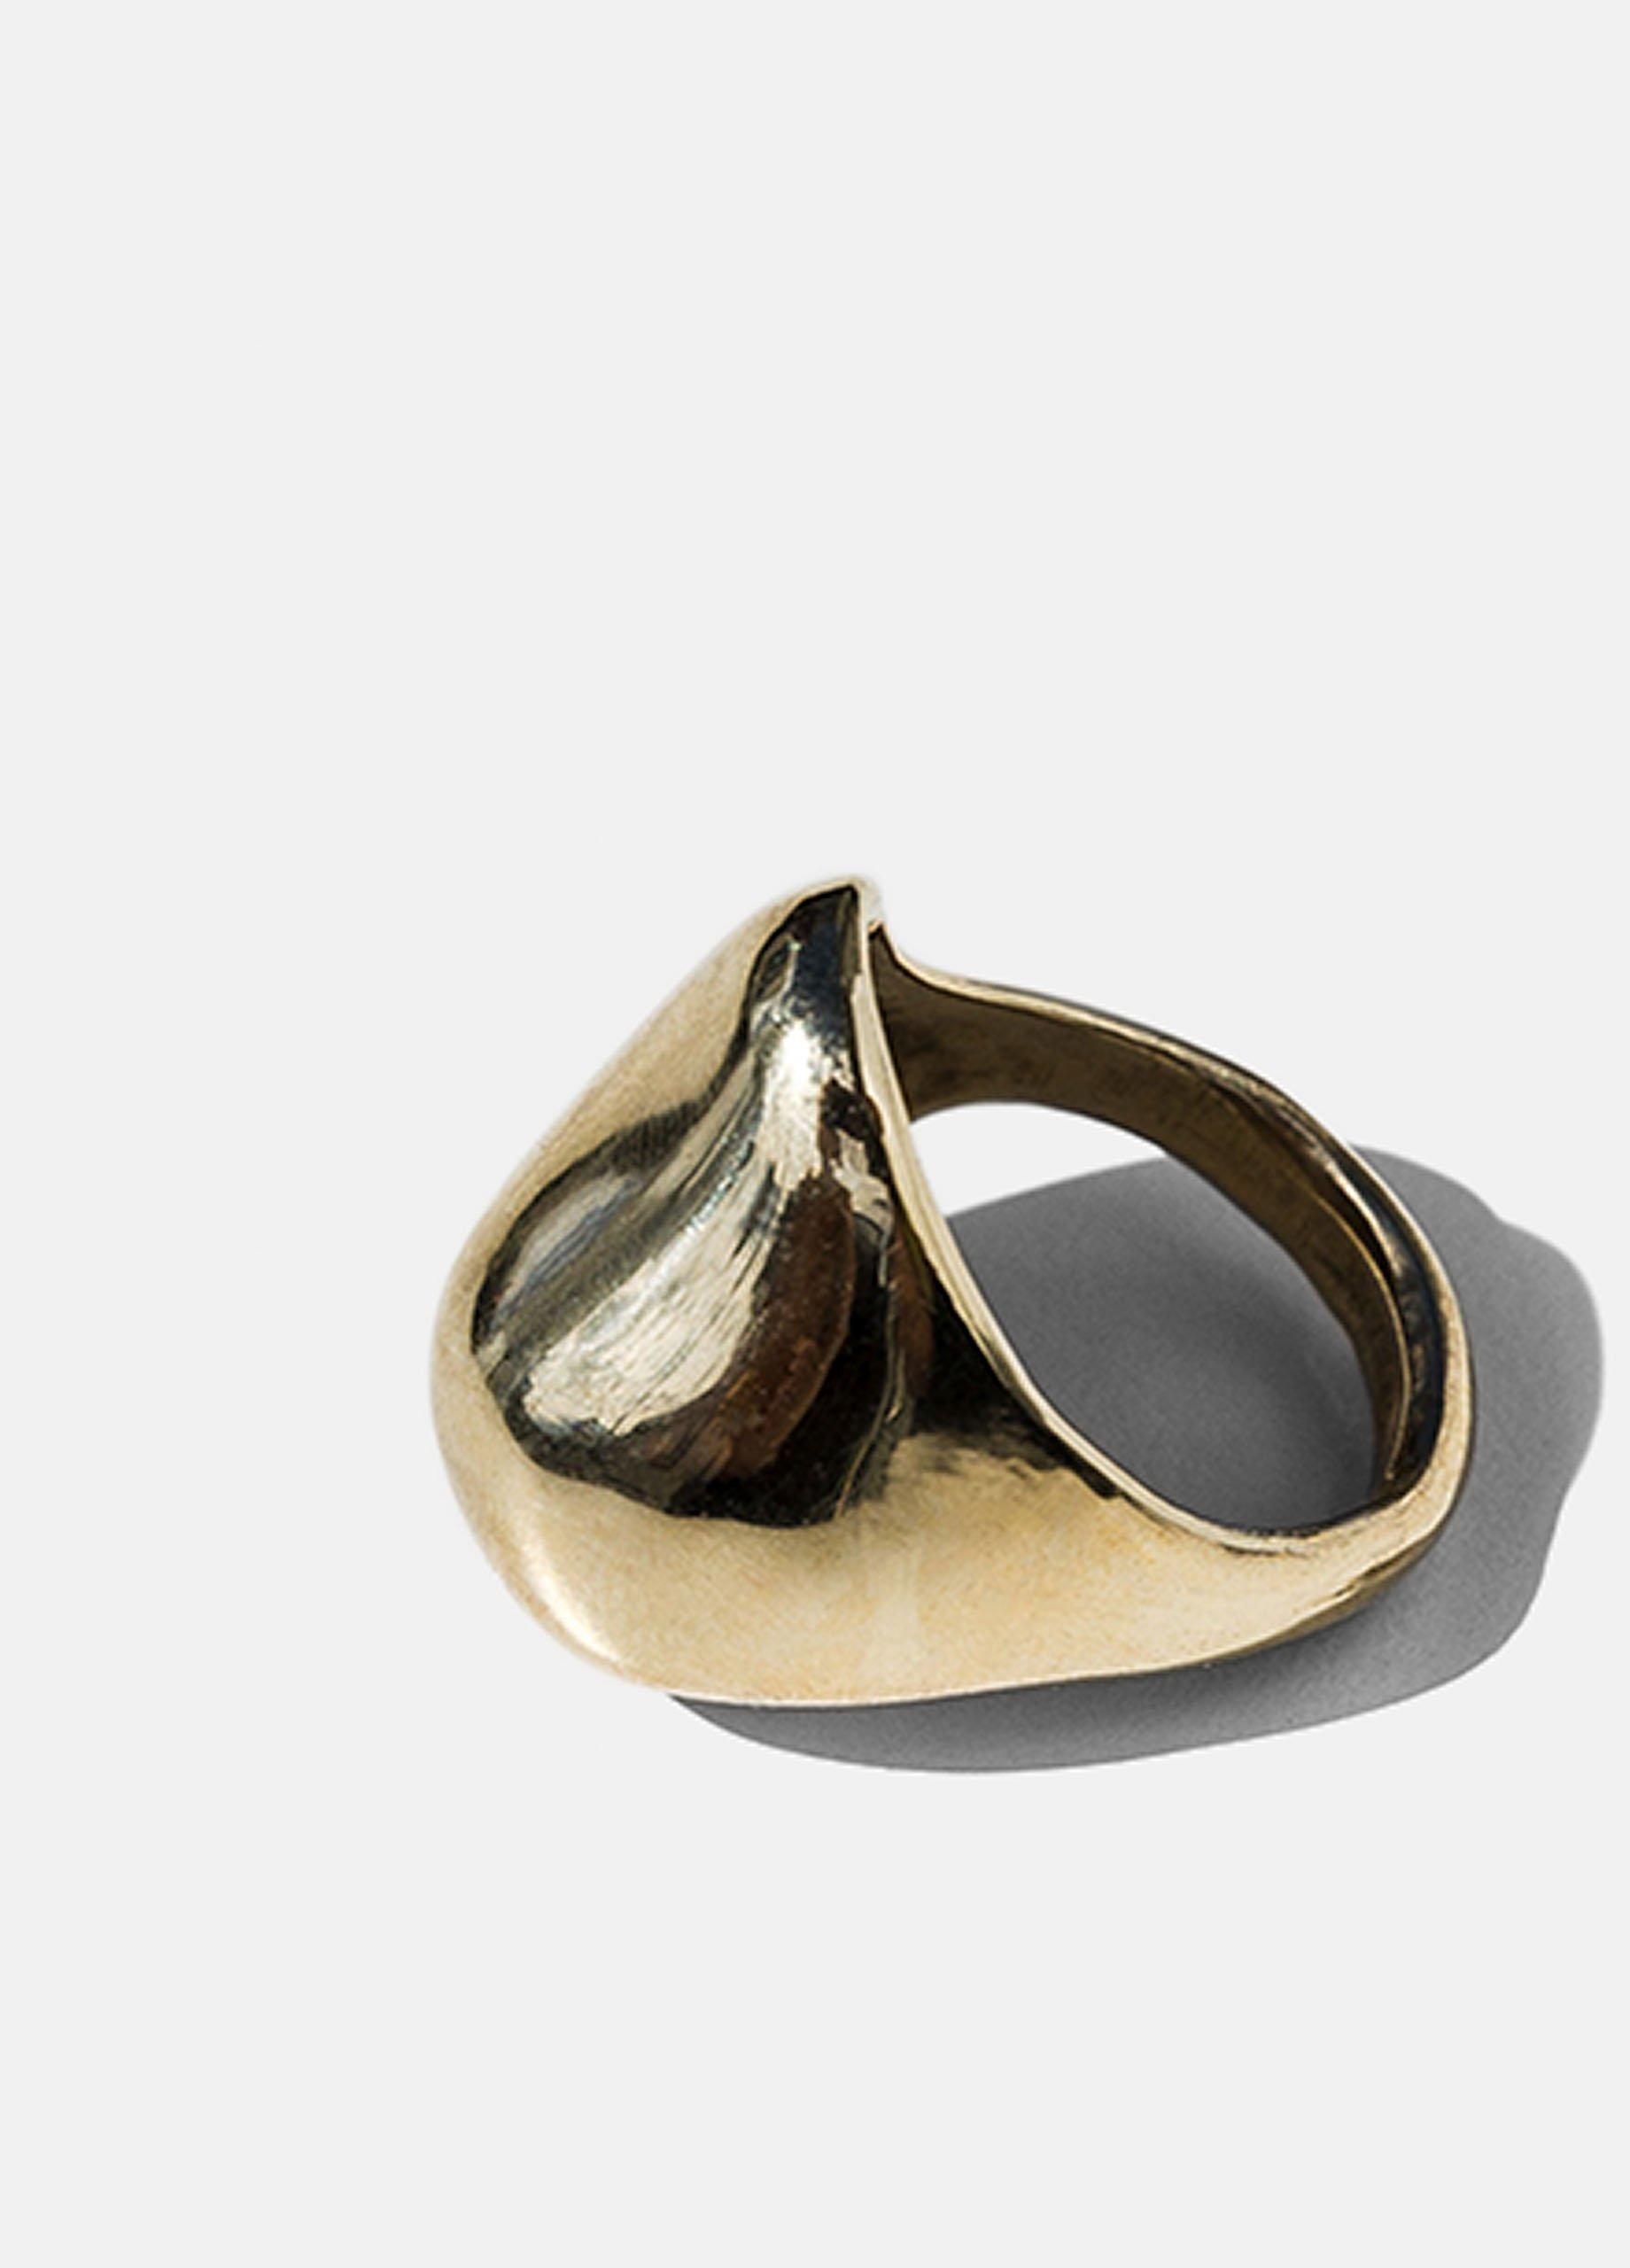 Faris / Nuez Ring